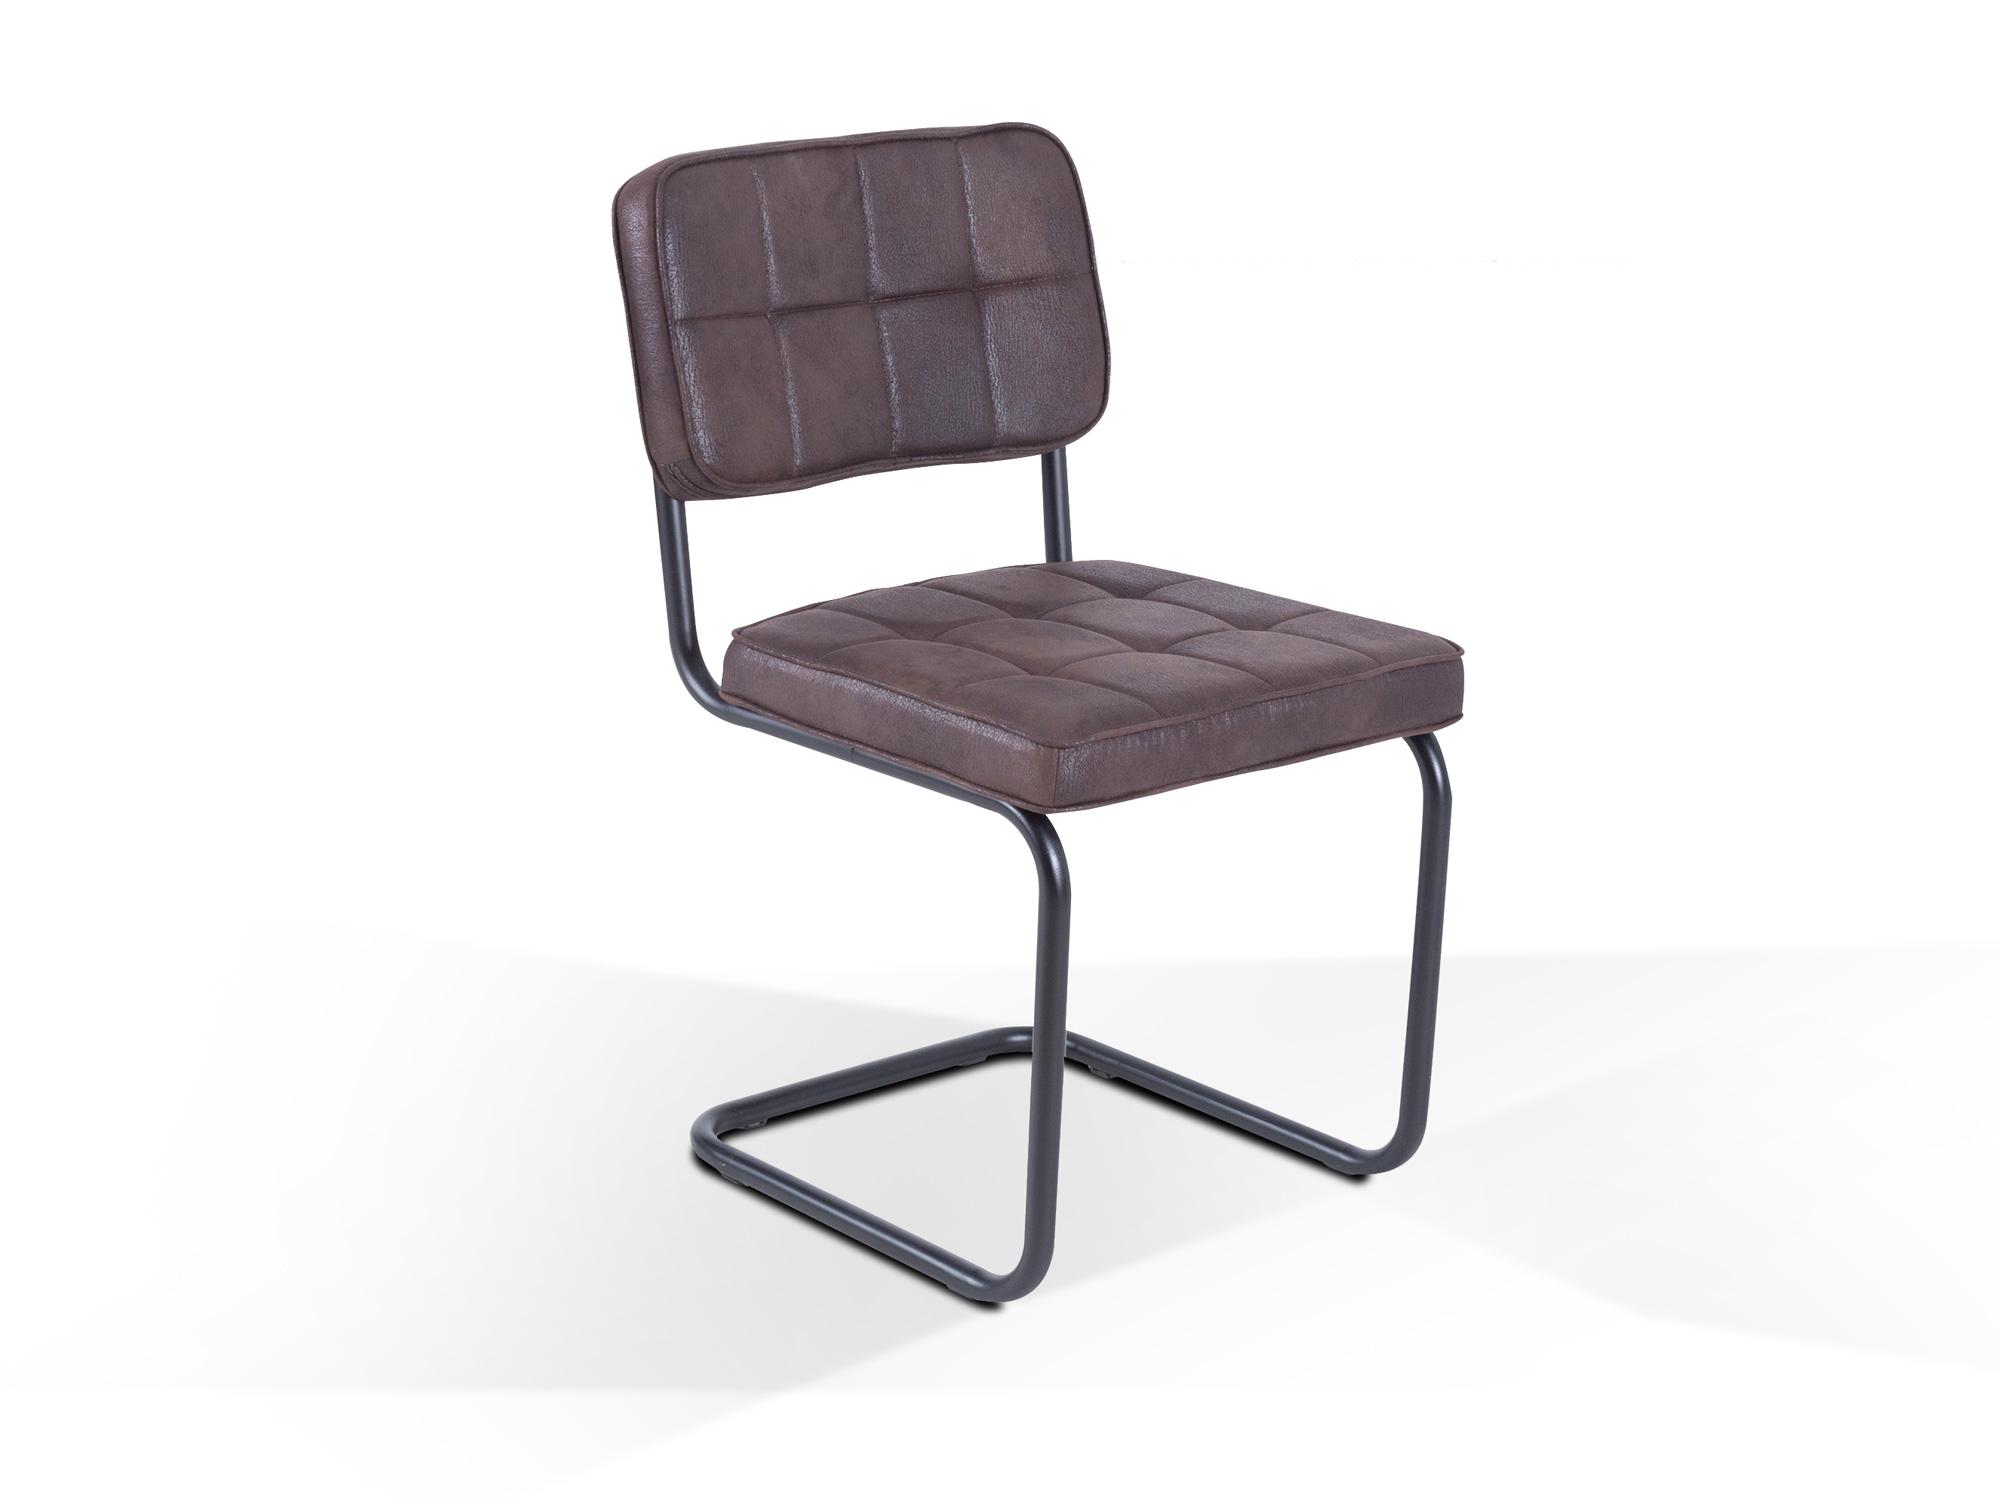 montana schwingstuhl schwarz dunkelbraun. Black Bedroom Furniture Sets. Home Design Ideas